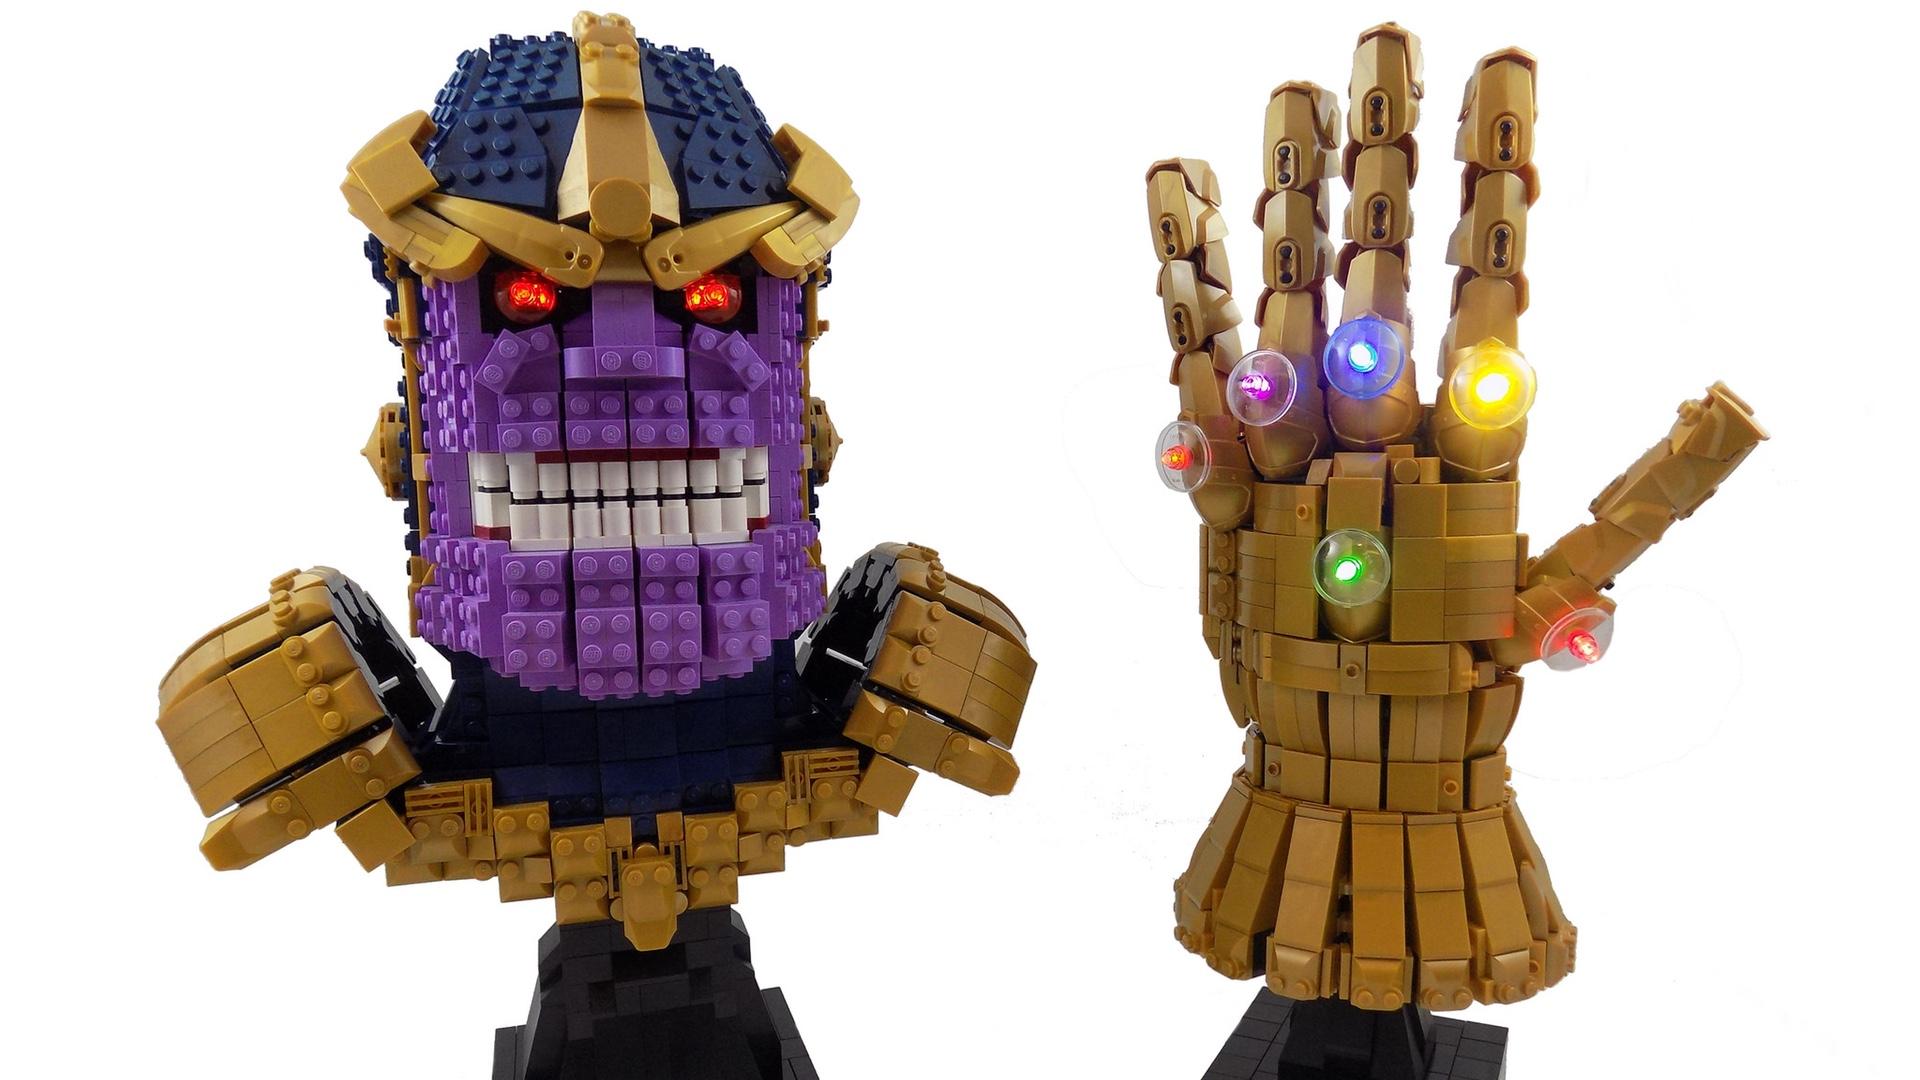 Lego Thanos Wields The Power Of The Lego Infinity Gauntlet Geektyrant